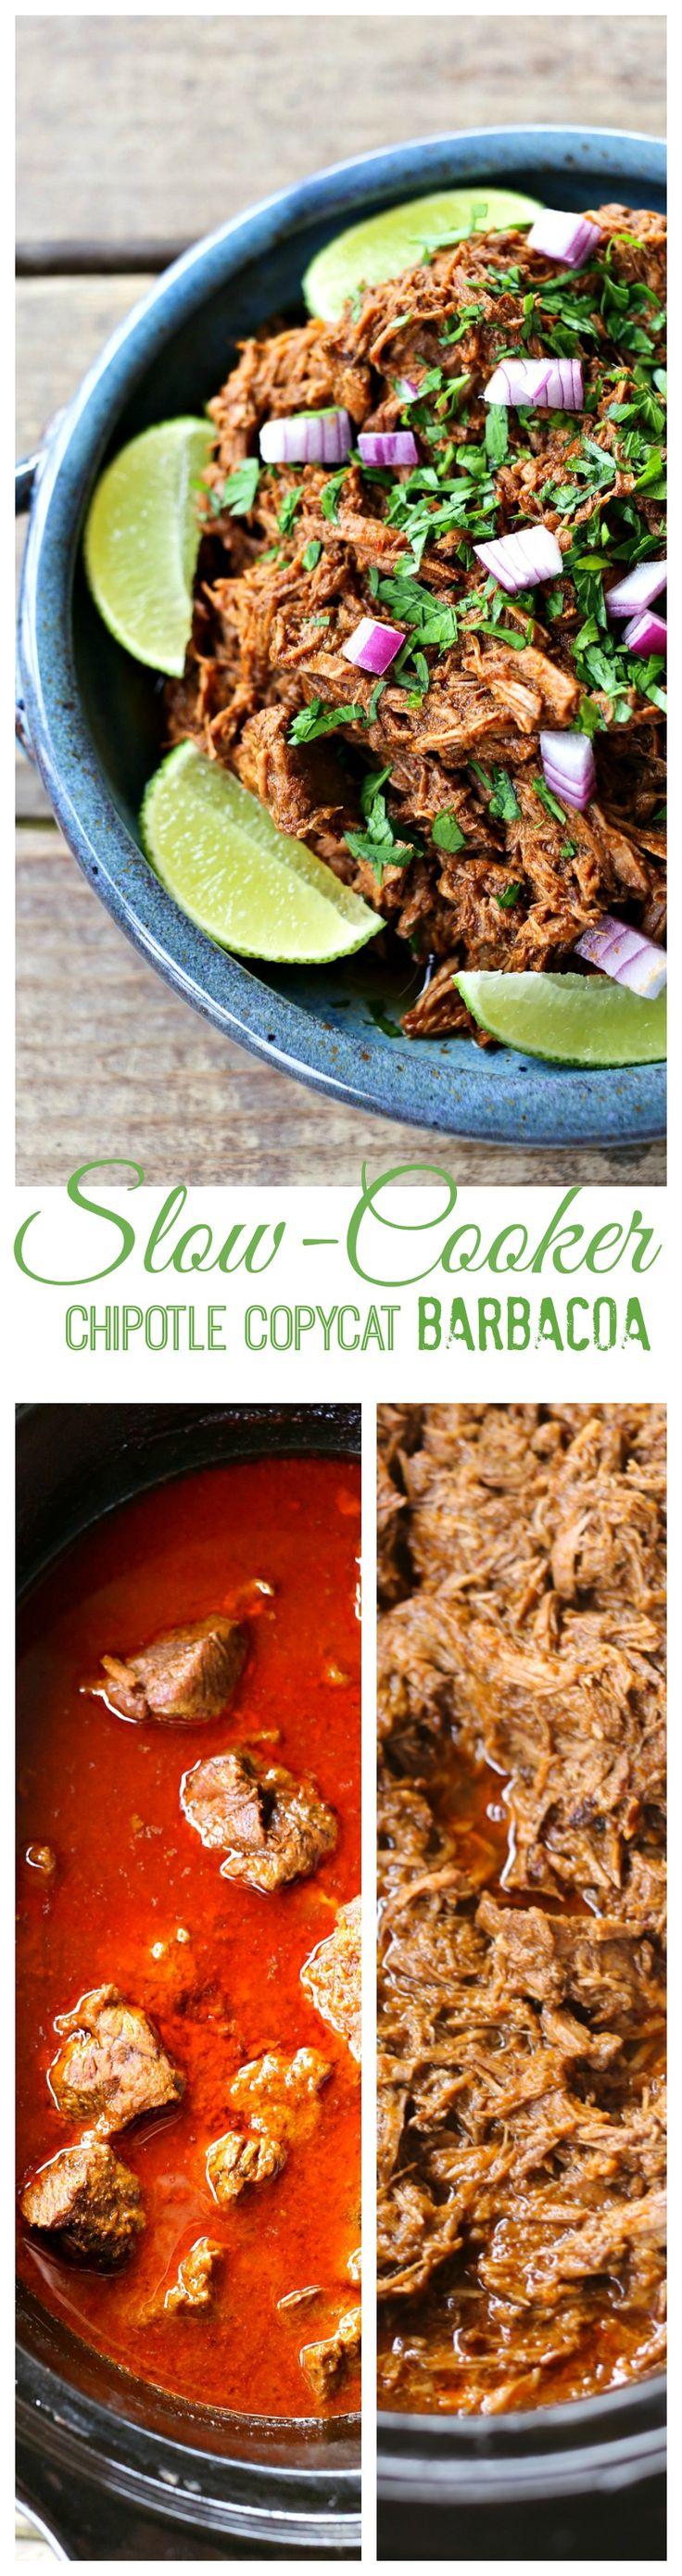 Crockpot Chipotle Copycat Barbacoa